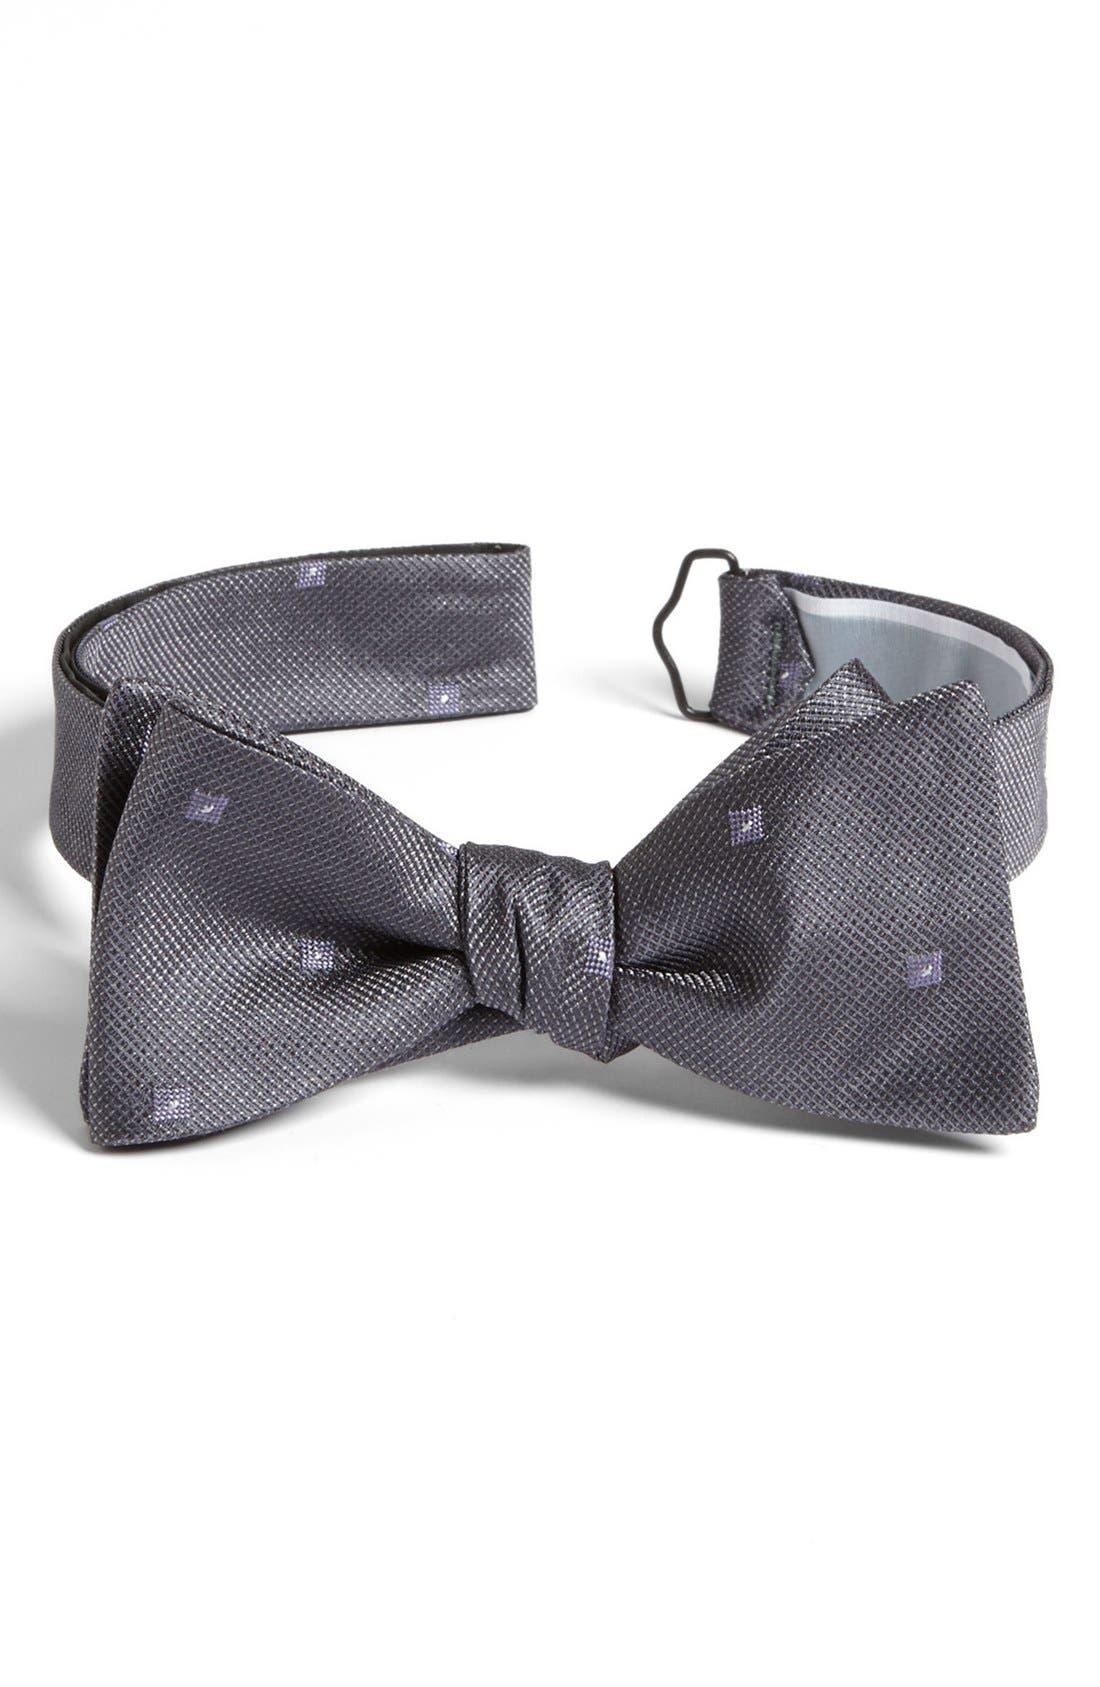 Alternate Image 1 Selected - Michael Kors Silk Bow Tie